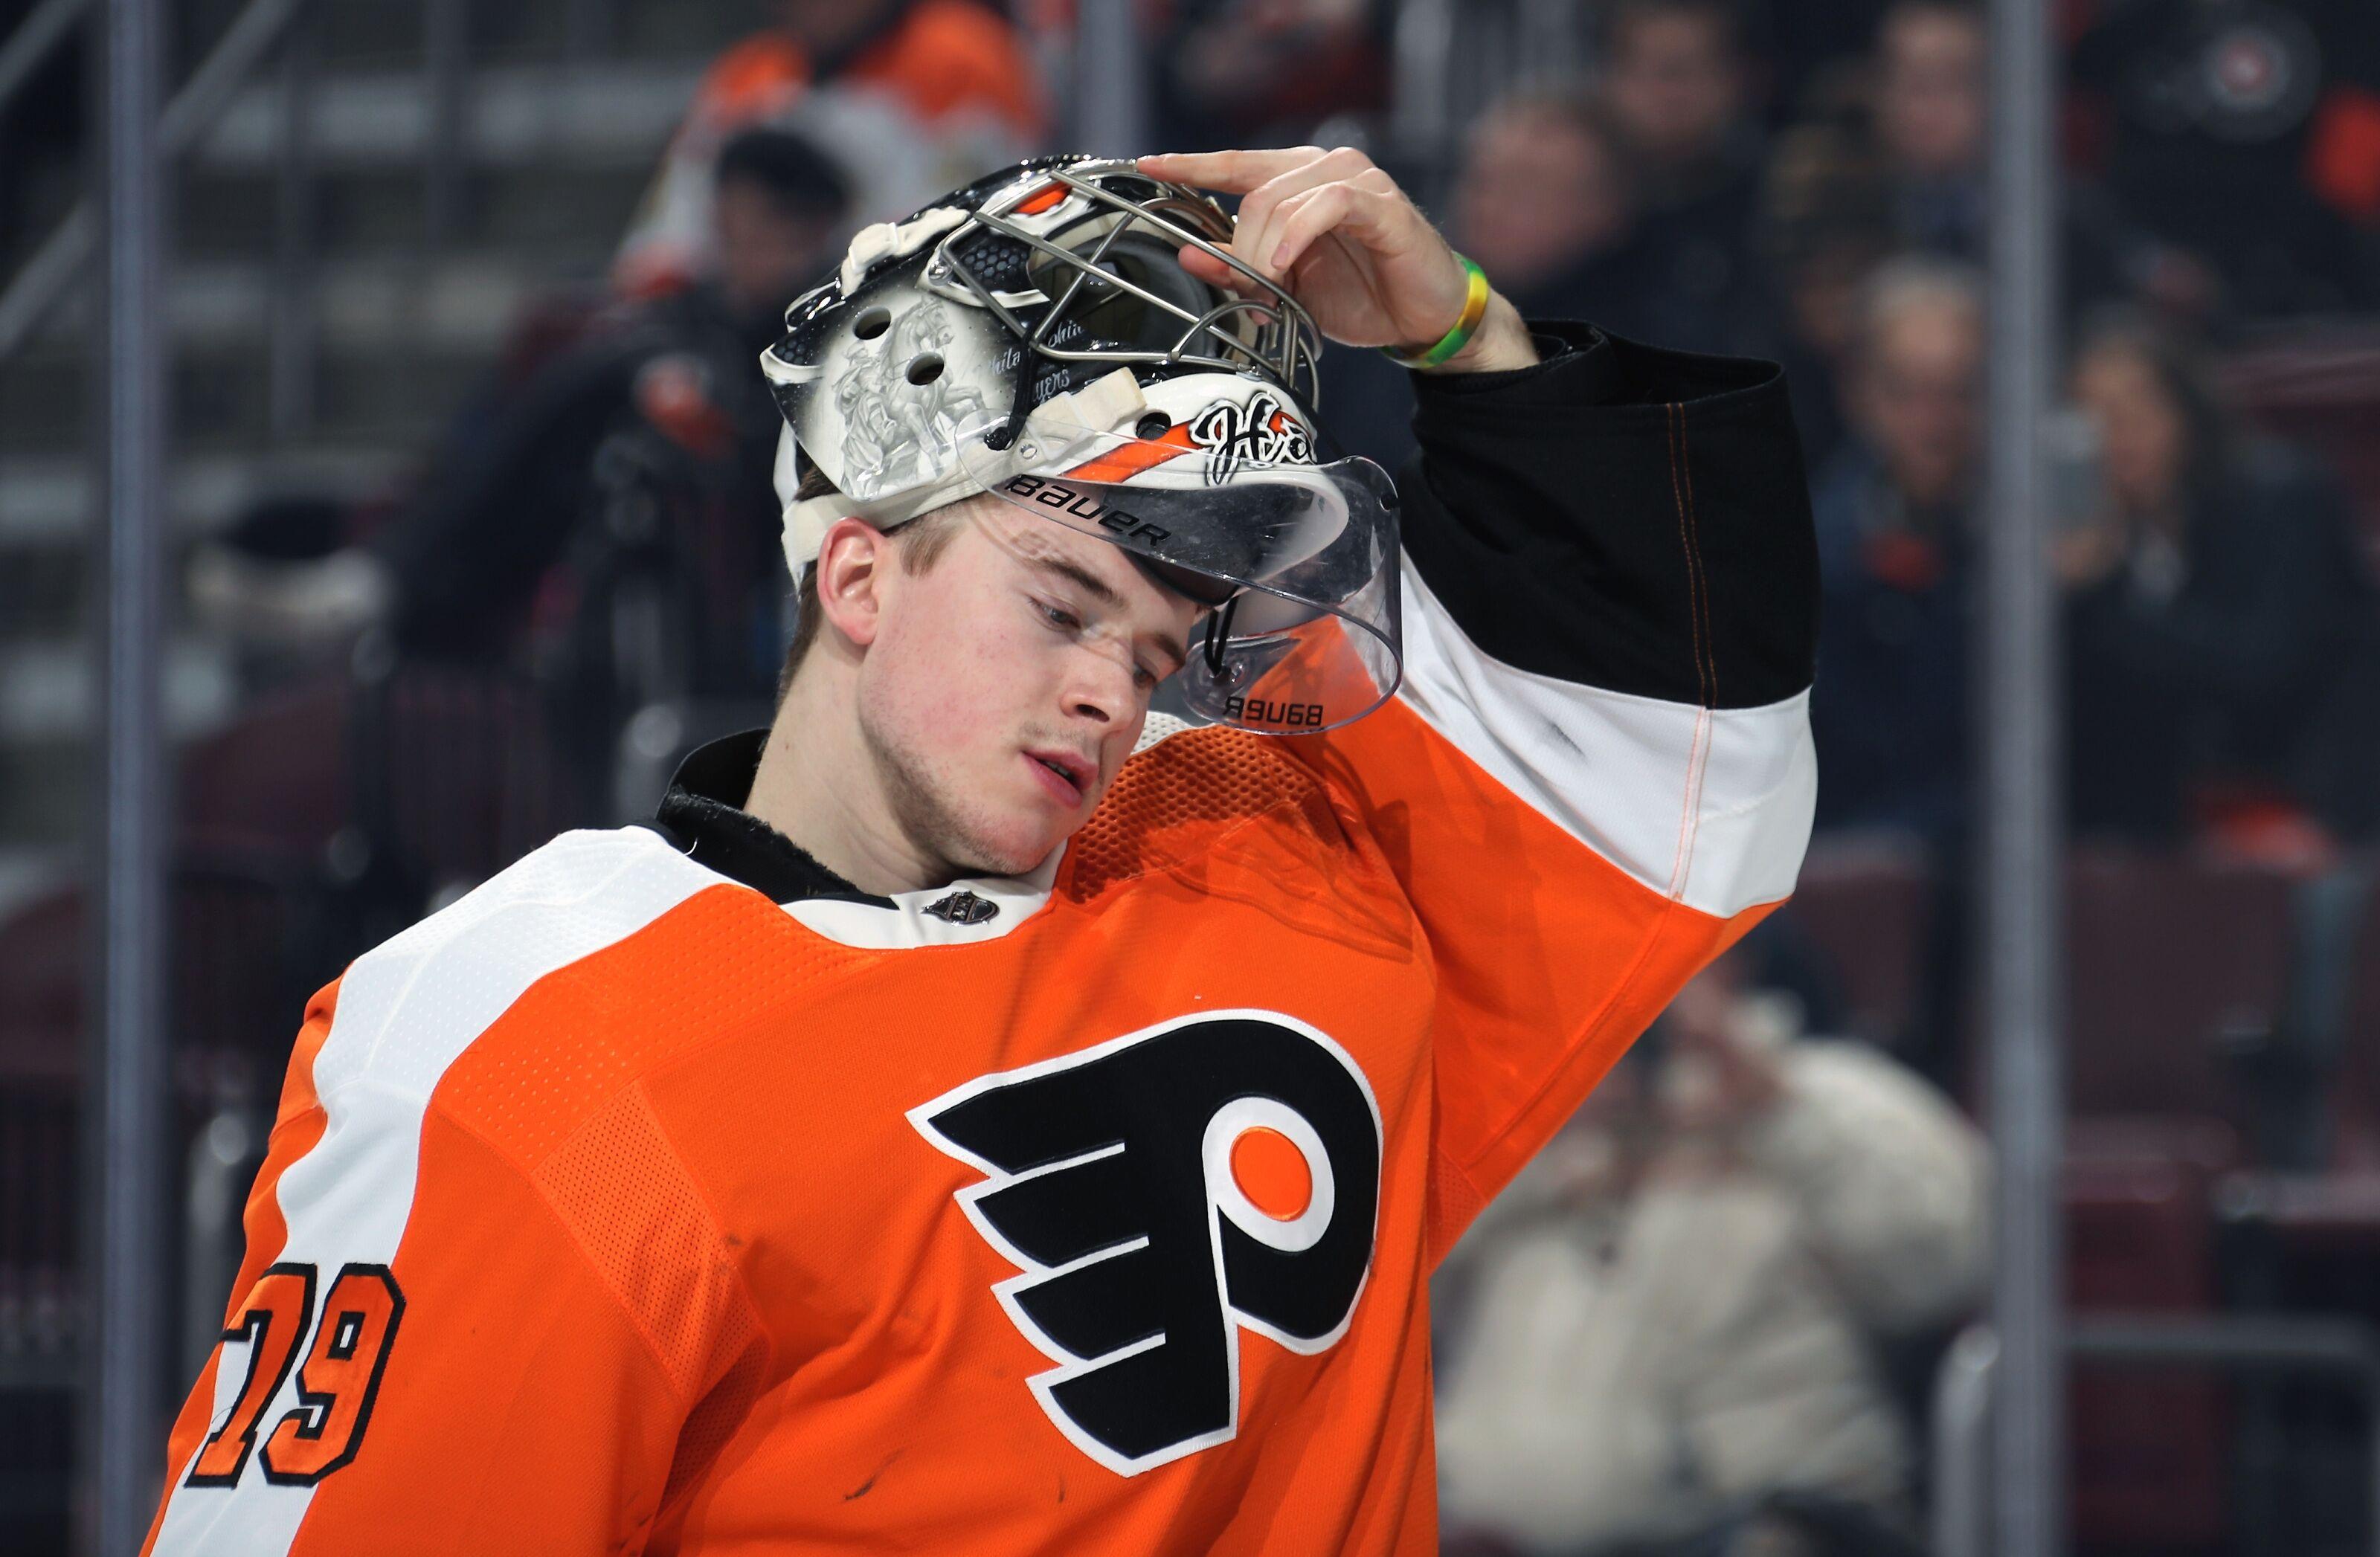 Philadelphia Flyers: Carter Hart proving his Goalie of the Future status